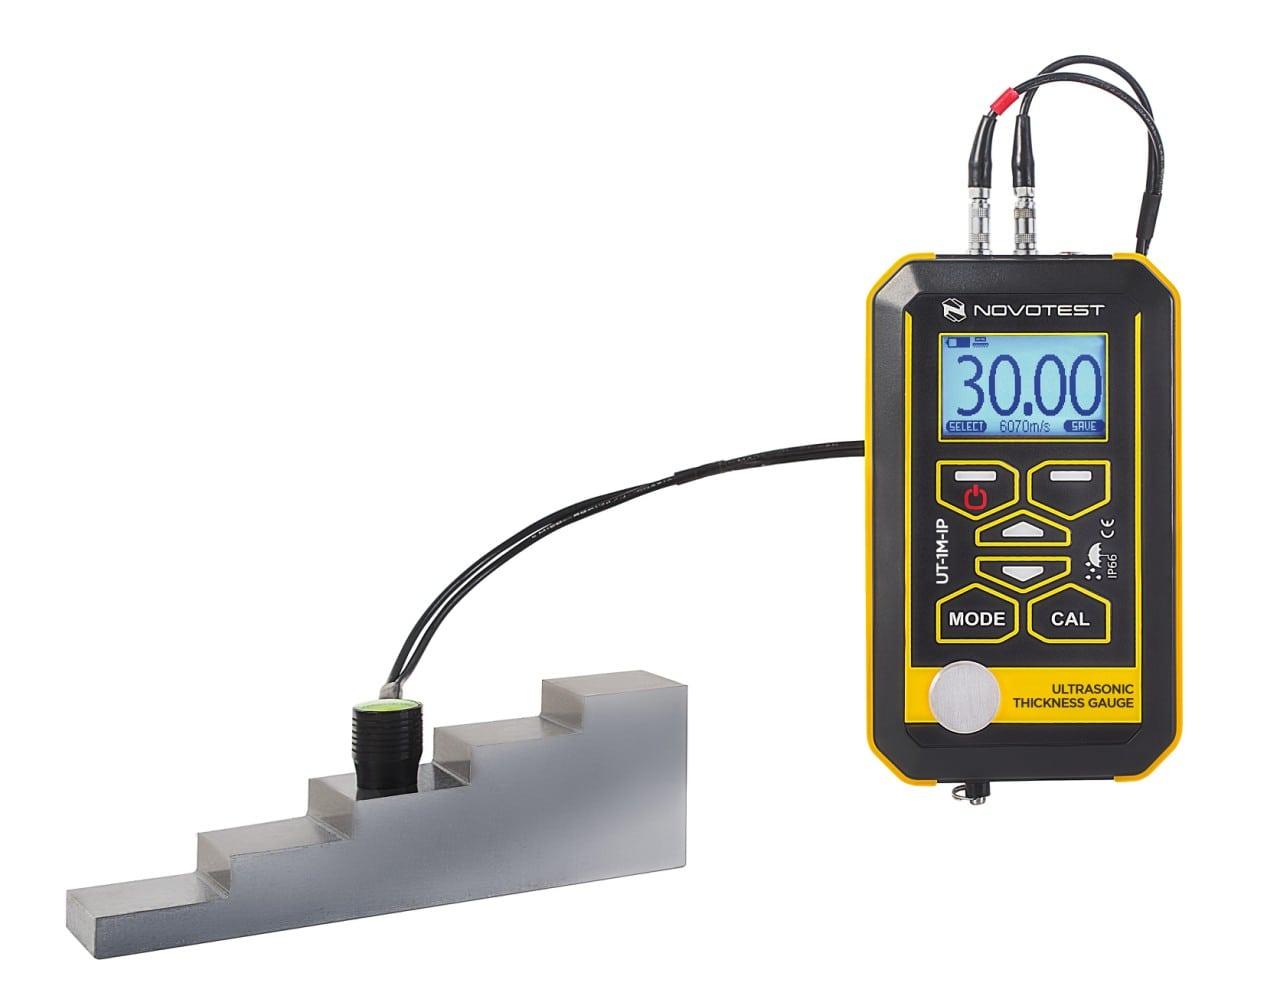 Ultrasonic Thickness Gauge NOVOTEST UT-1M-IP-4